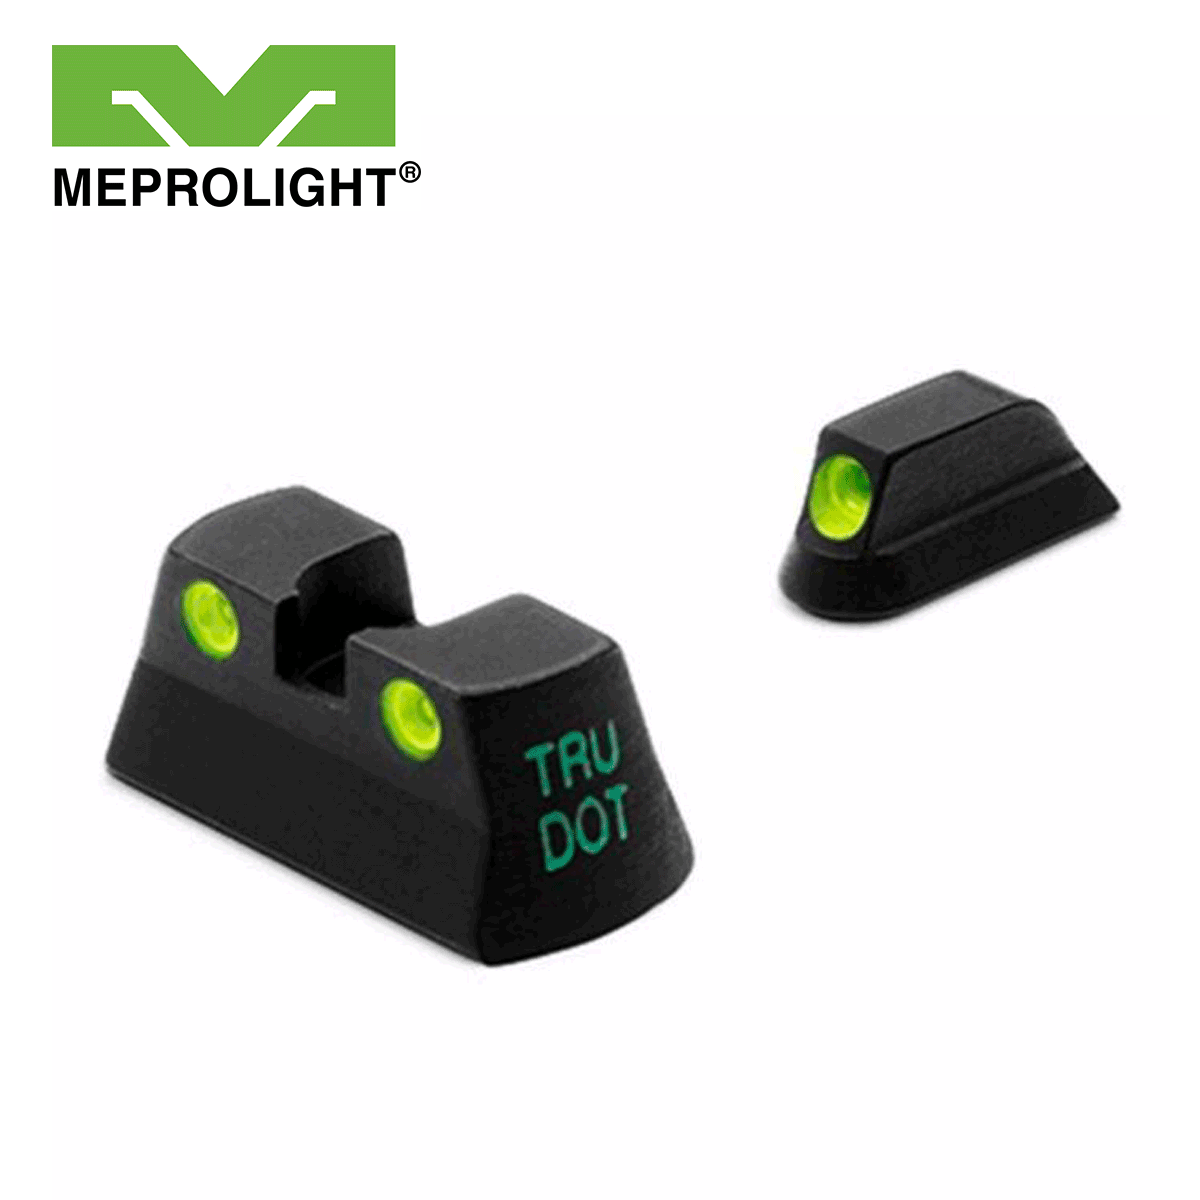 Meprolight Tru Dot Night & Day CZ Sight For CZ Day 75 / 85 & 75D PCR Compact - ML-17777 3d91f5